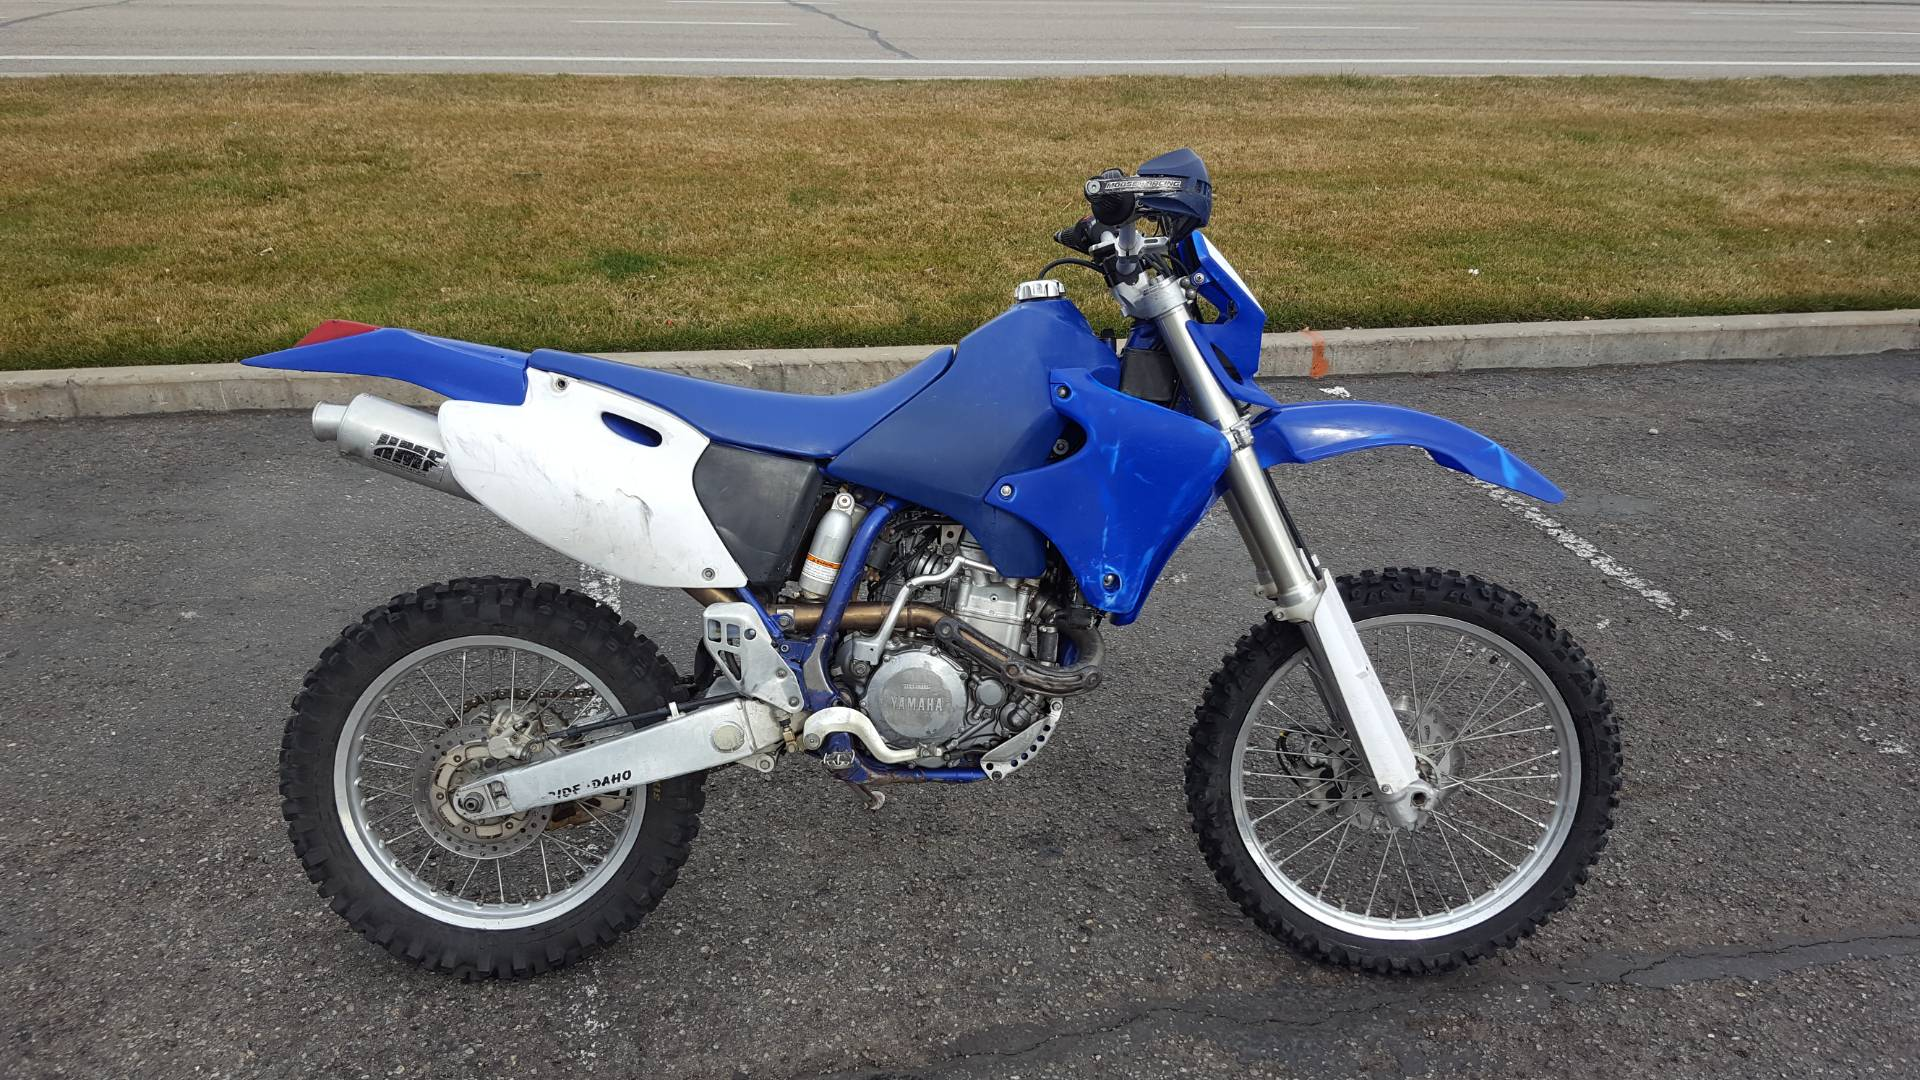 1998 WR 400